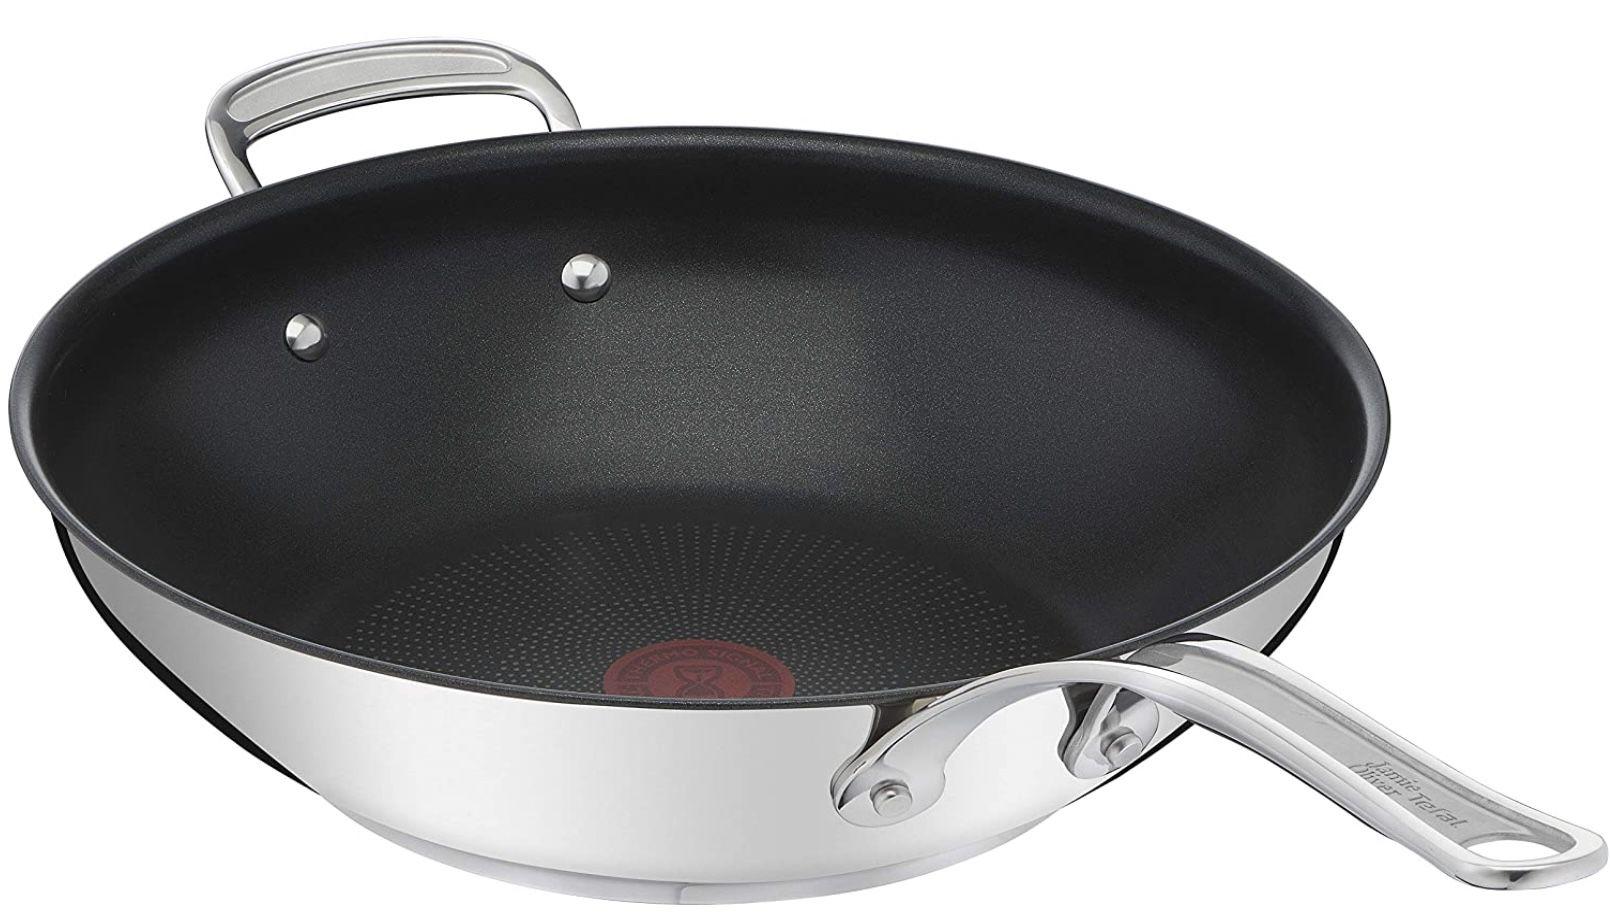 Tefal E30688 Jamie Oliver Cooks Classic Wokpfanne mit 30cm für 69,99€ (statt 86€)